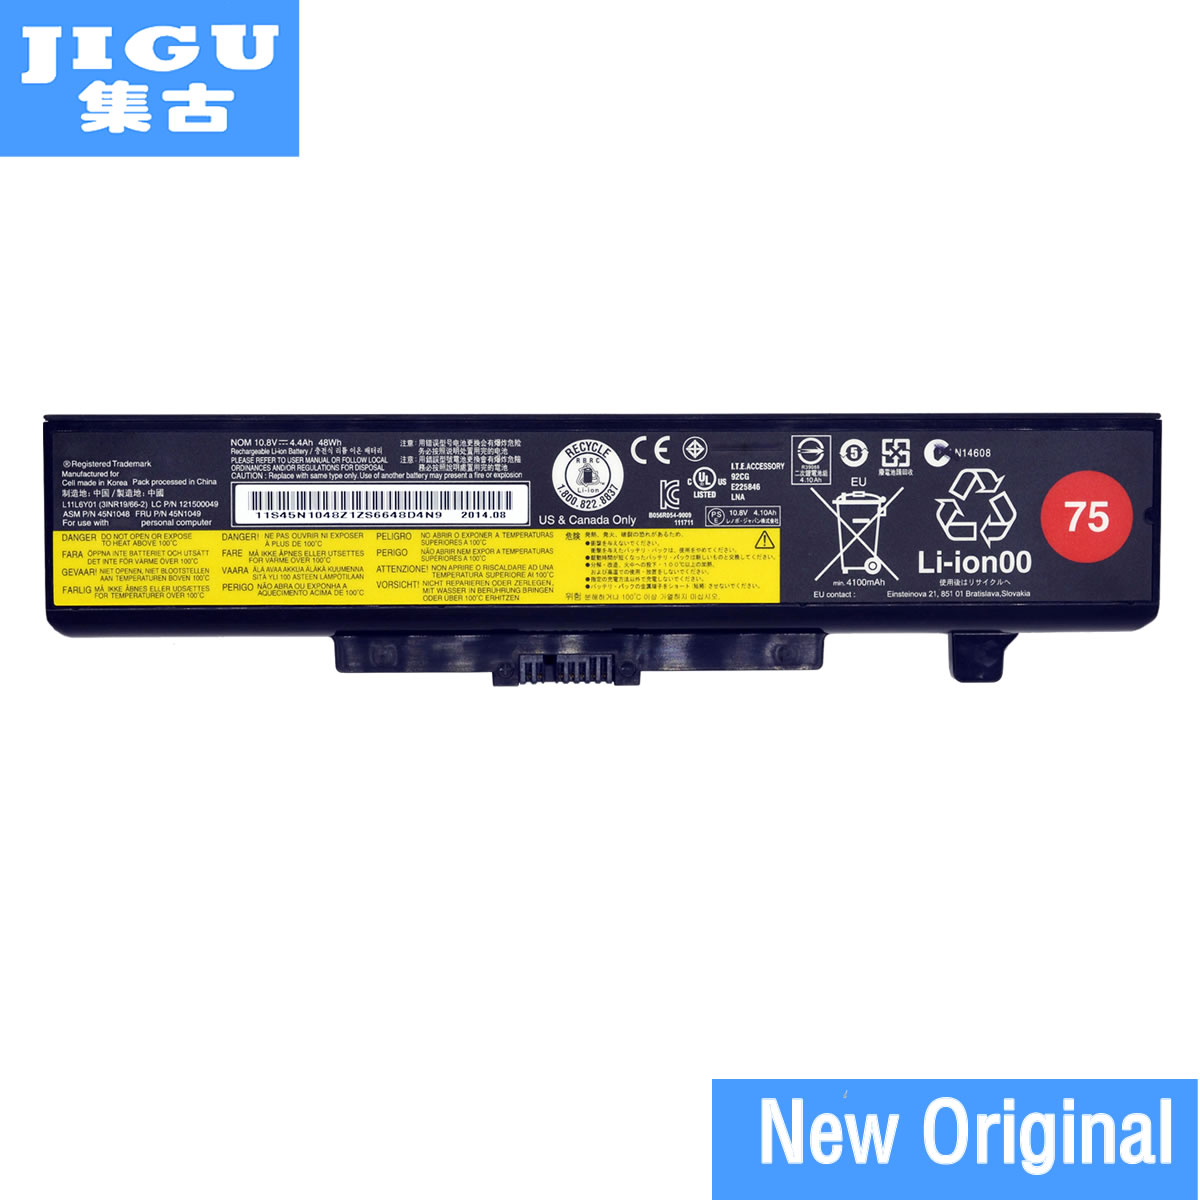 JIGU Original Battery For Lenovo For IdeaPad Y485p Y480 B590 G710 N581 G700 P585 B490 Series For ThinkPad E540 E440 E531 E431